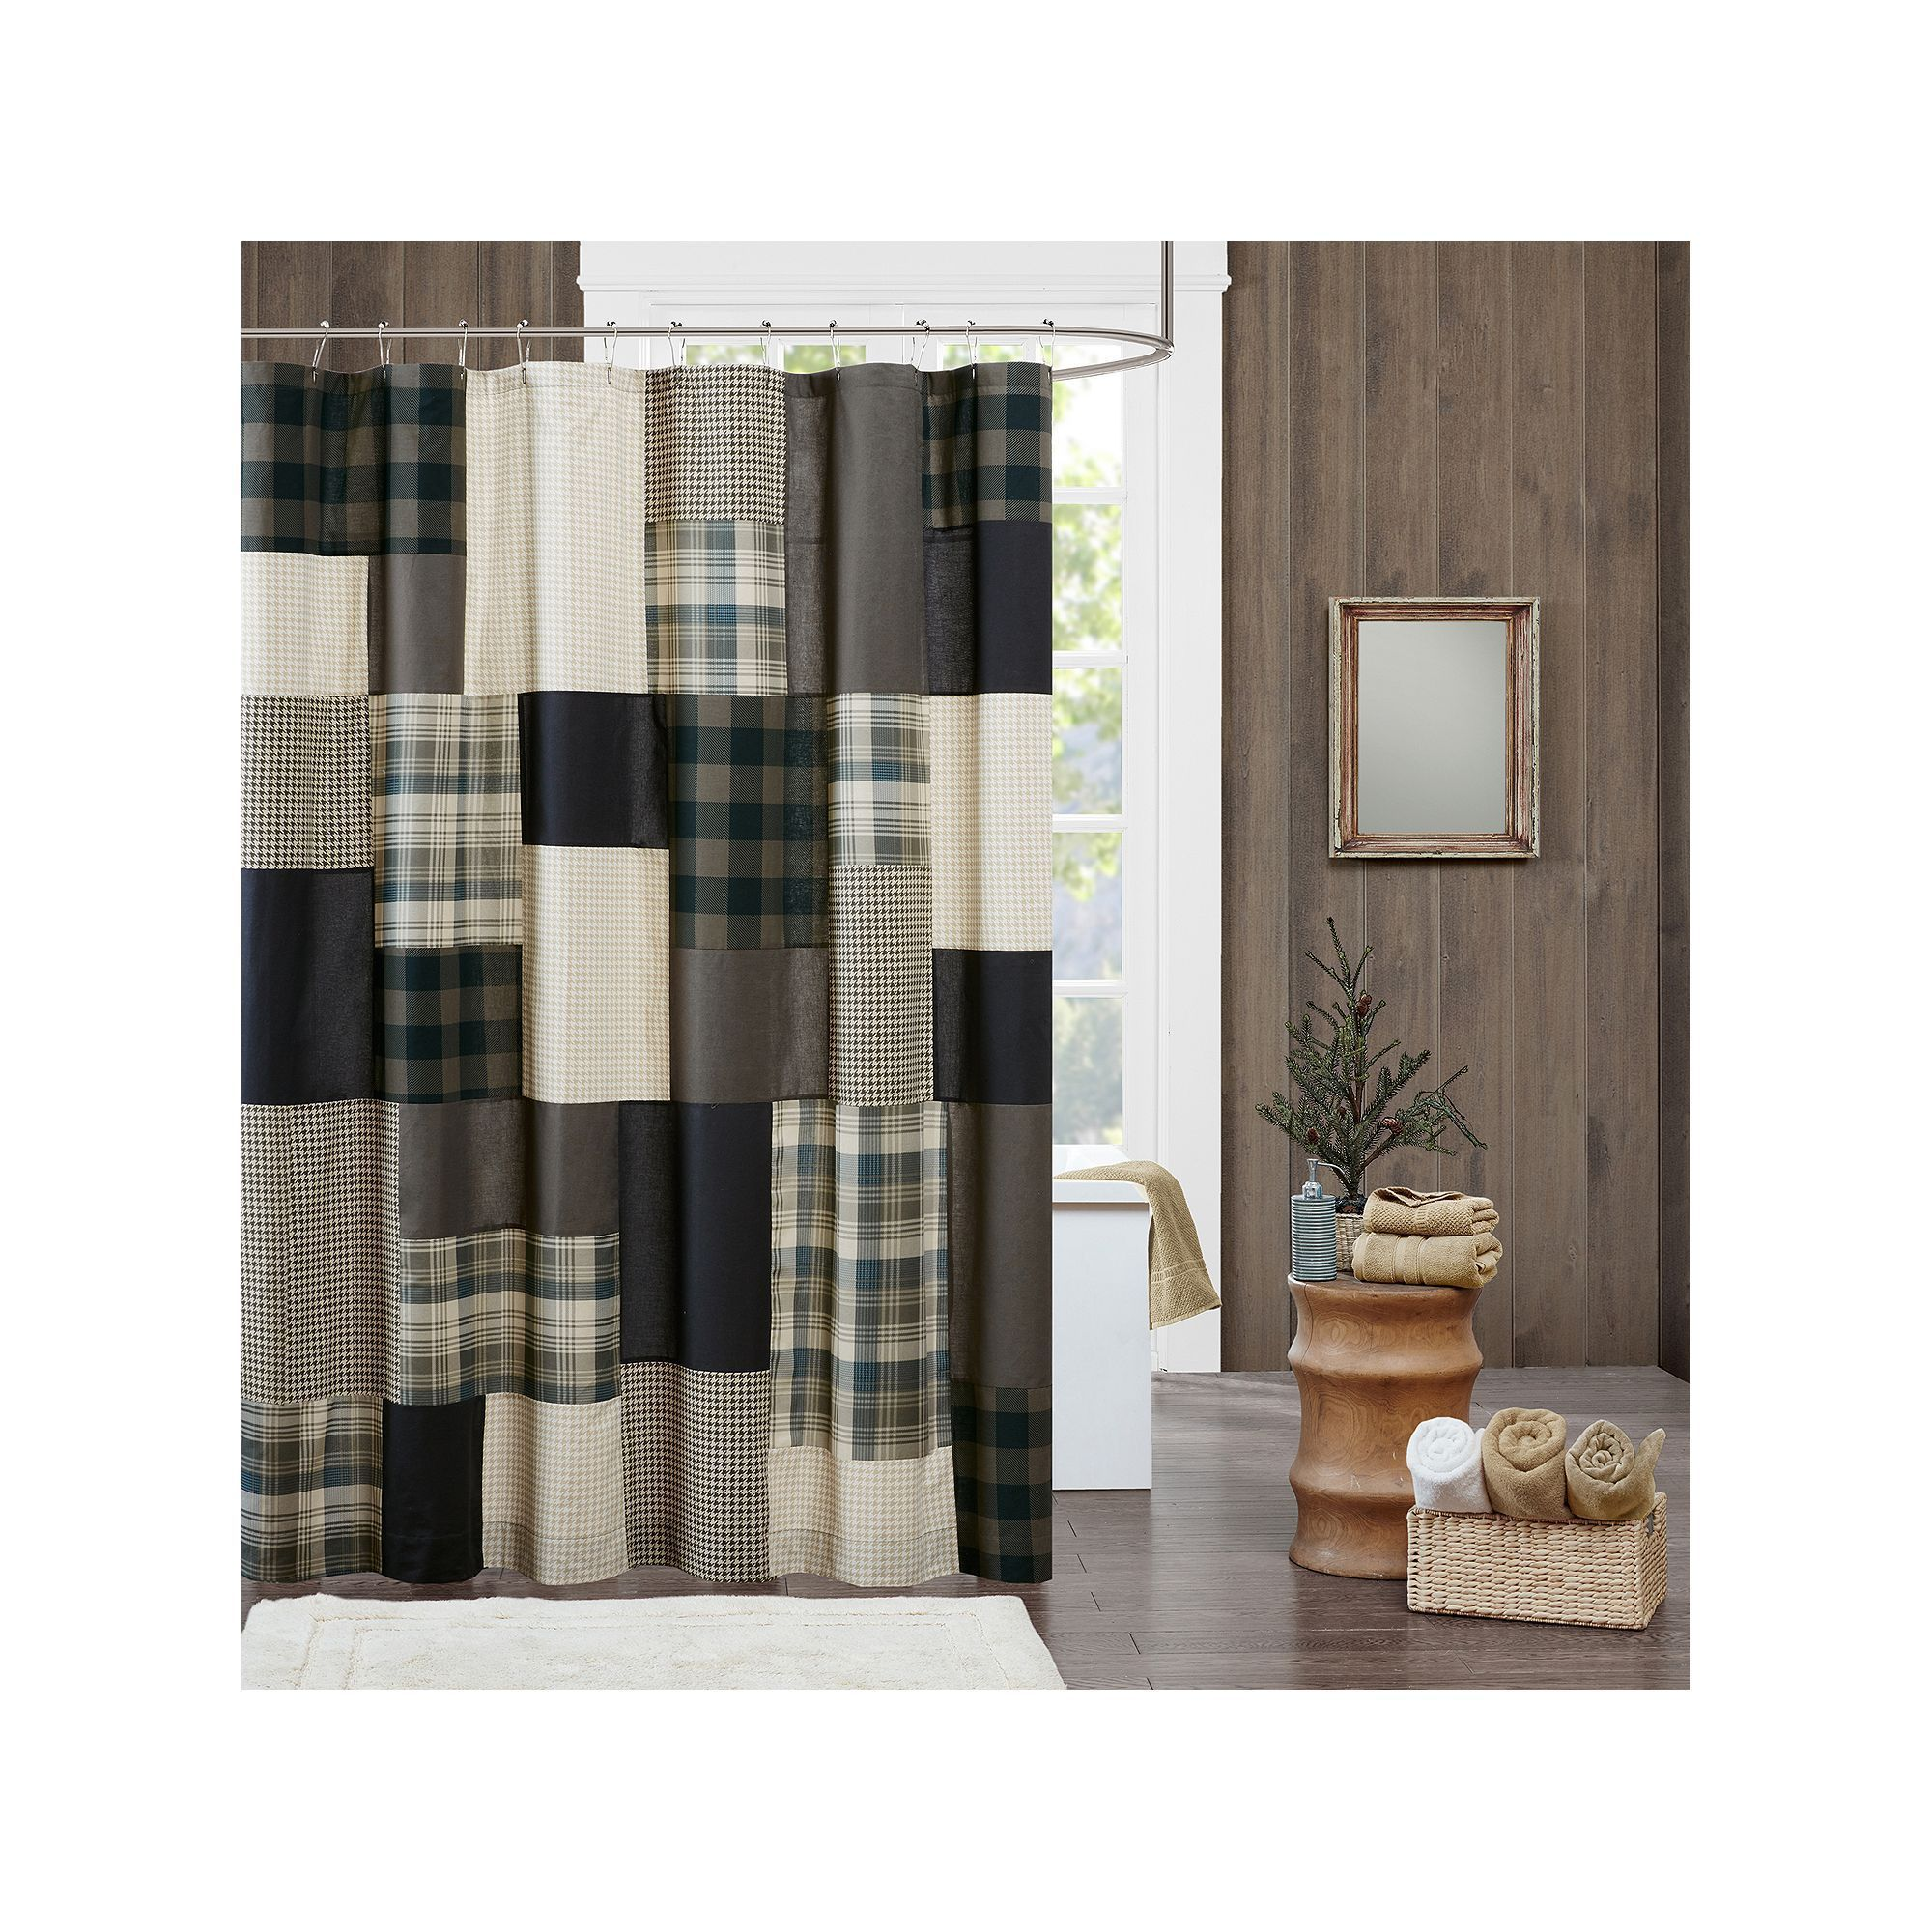 Woolrich Winter Hills Shower Curtain Beig Green Beig Khaki